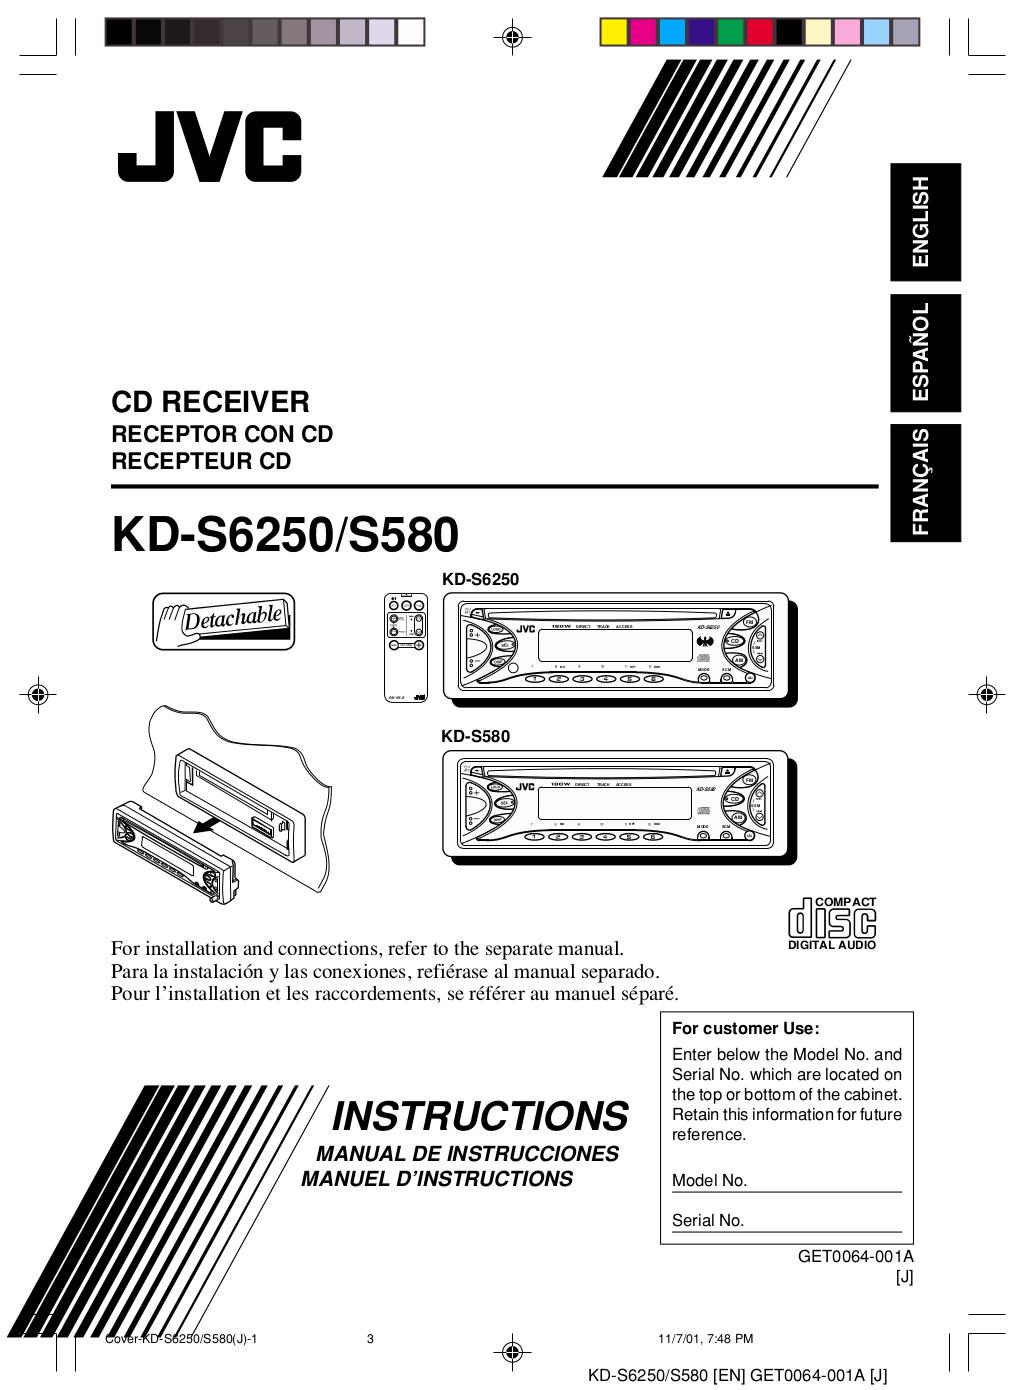 Jvc Wiring Diagram Kd S580